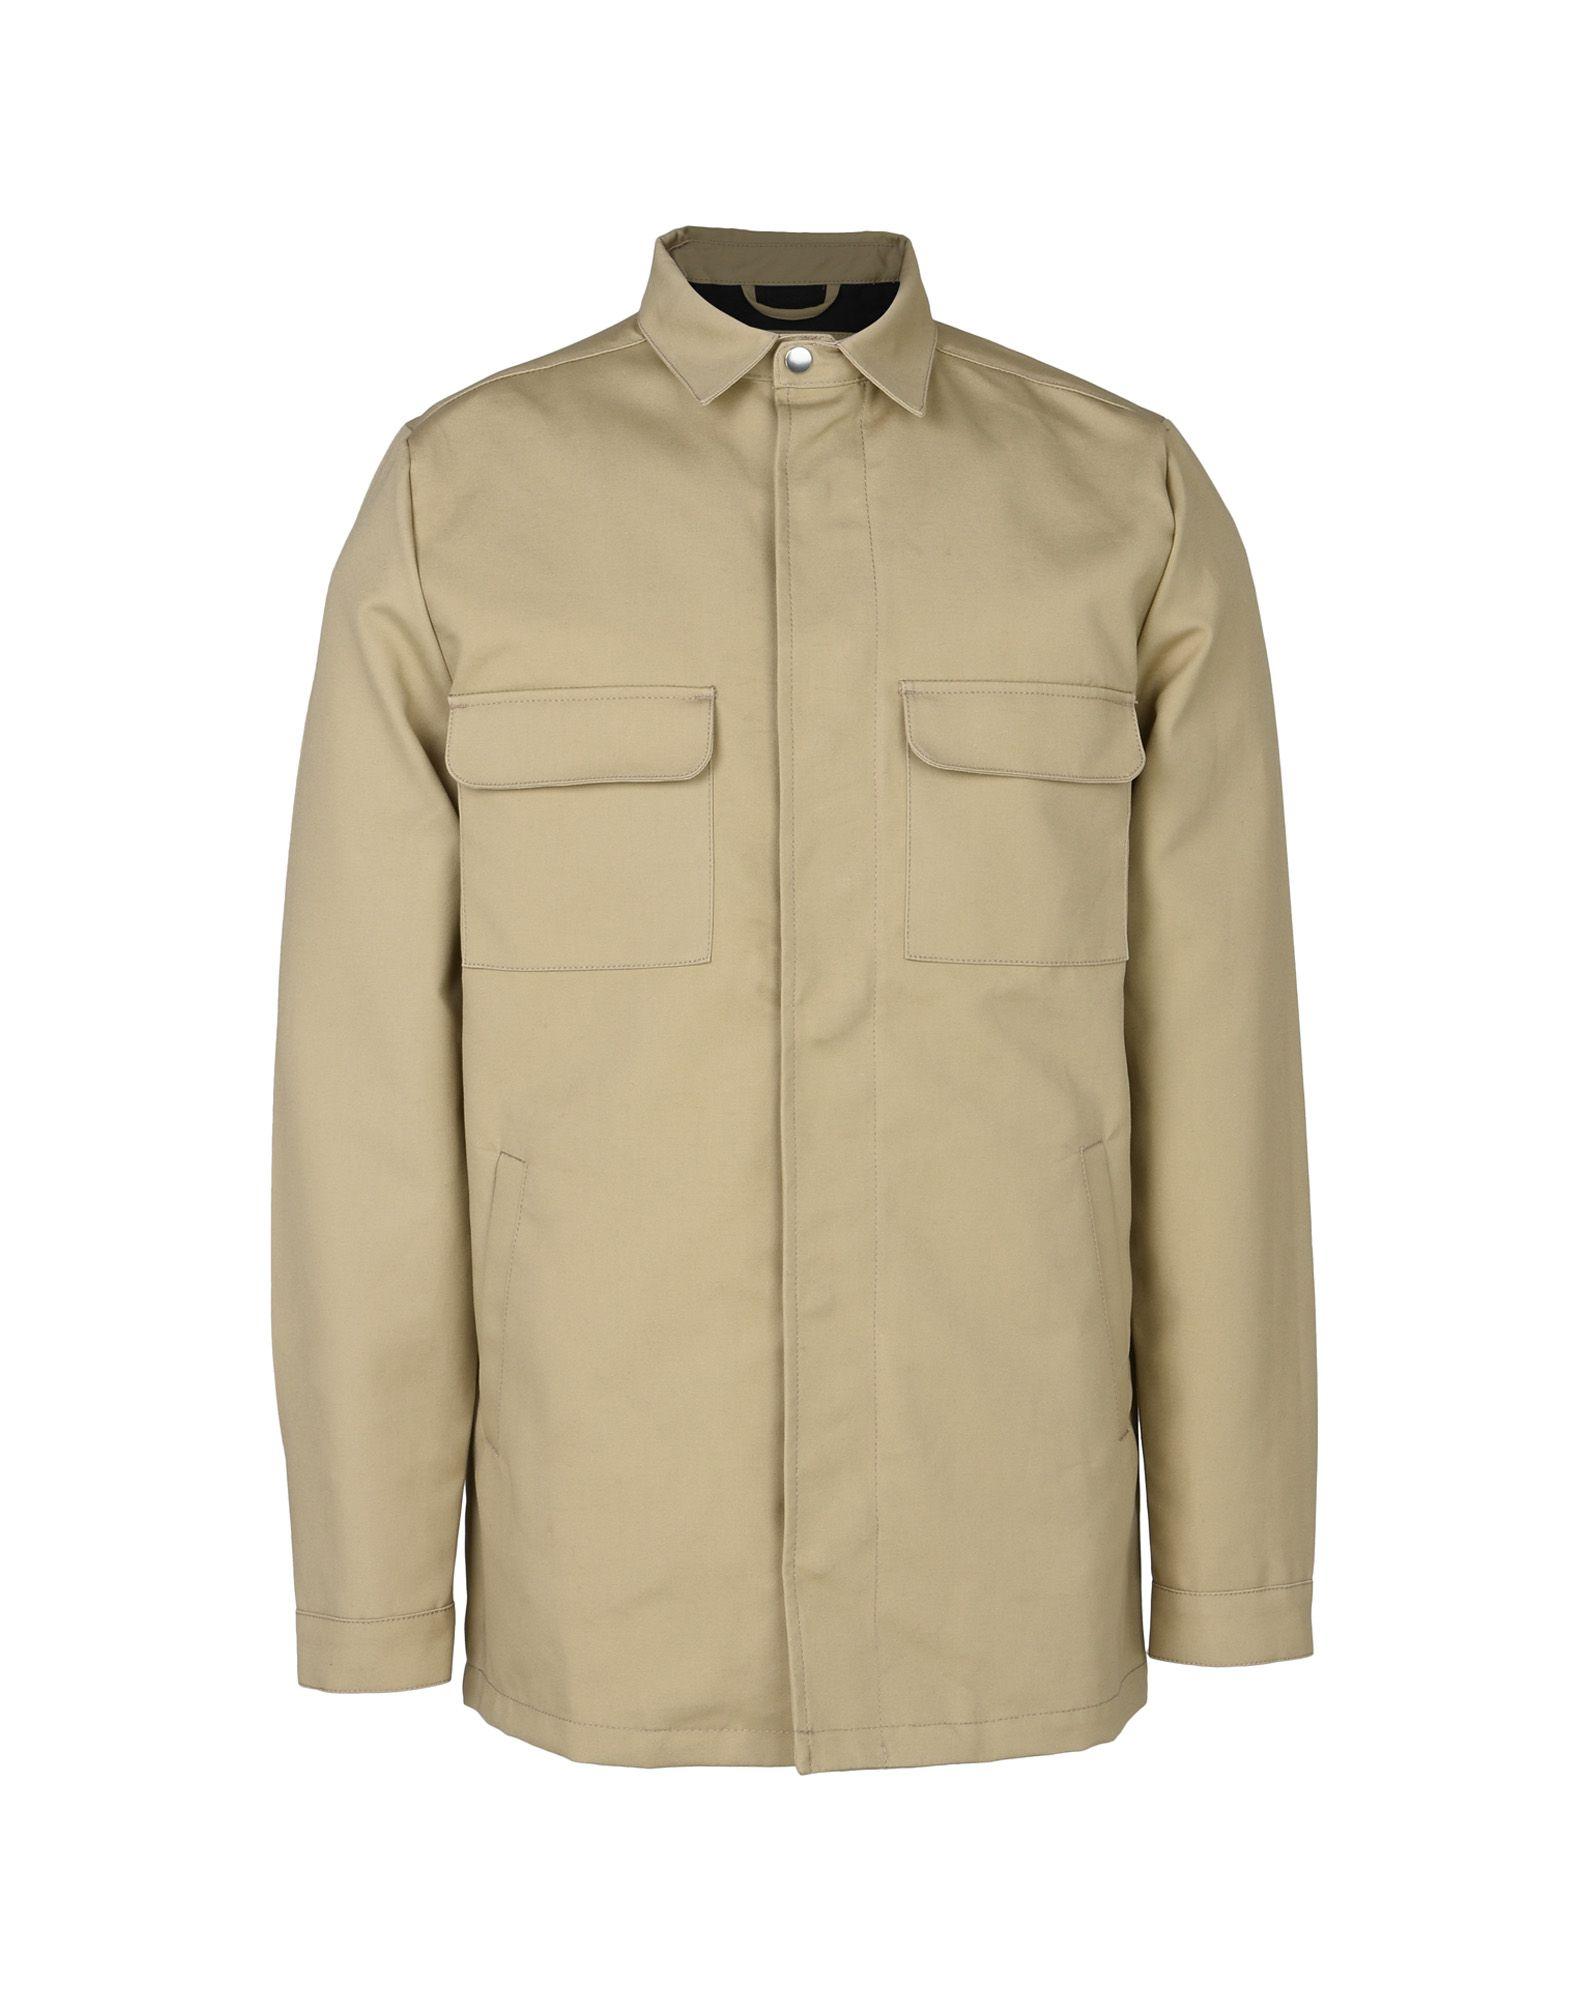 Giacca Rvlt/Revolution 7477 Cotton Jacket Worker Style - Uomo - Acquista online su